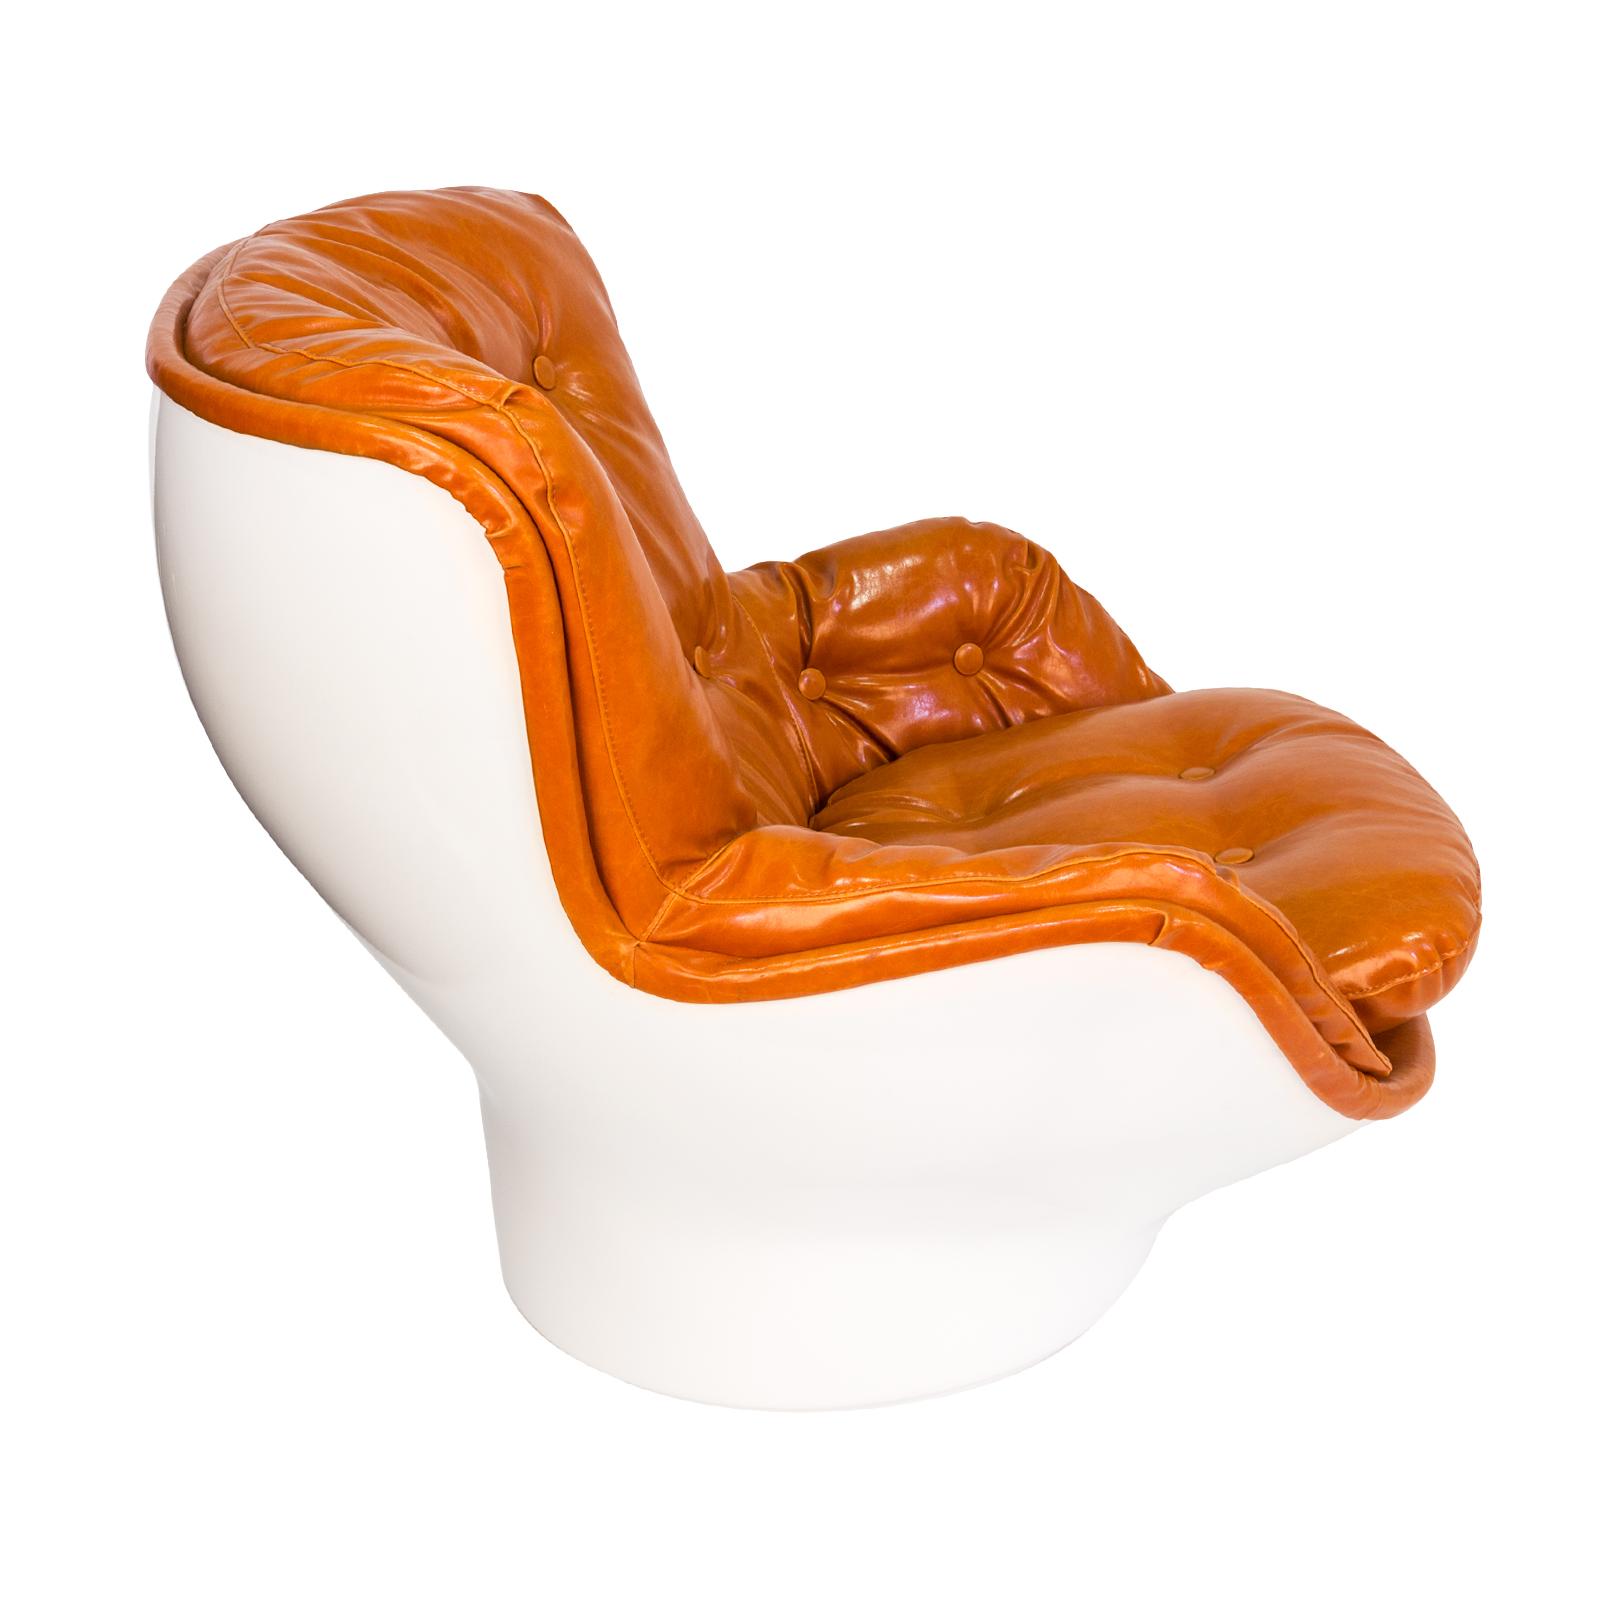 Airborne Swivel Lounge Chair Rentals Event Chair Rentals